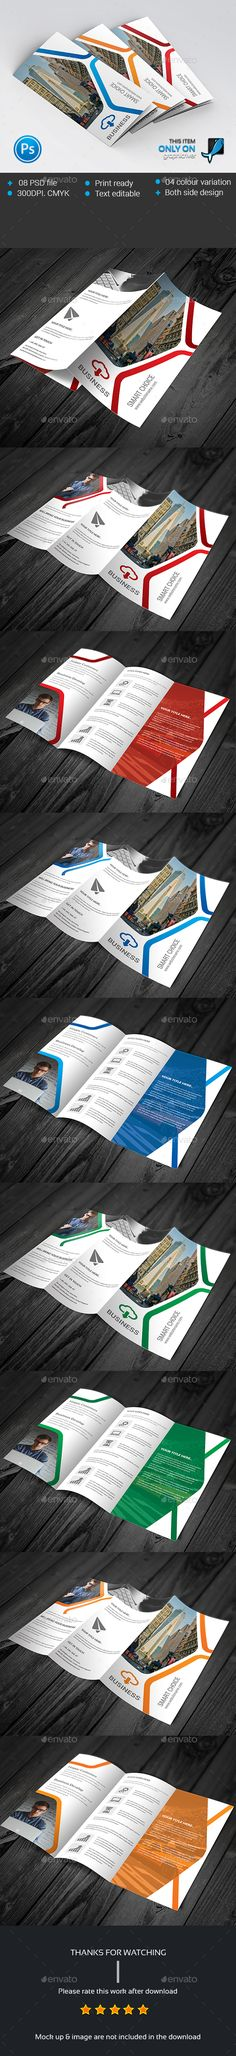 Corporate Trifold Brochure Template PSD #design Download: http://graphicriver.net/item/corporate-trifold-brochure/13919969?ref=ksioks